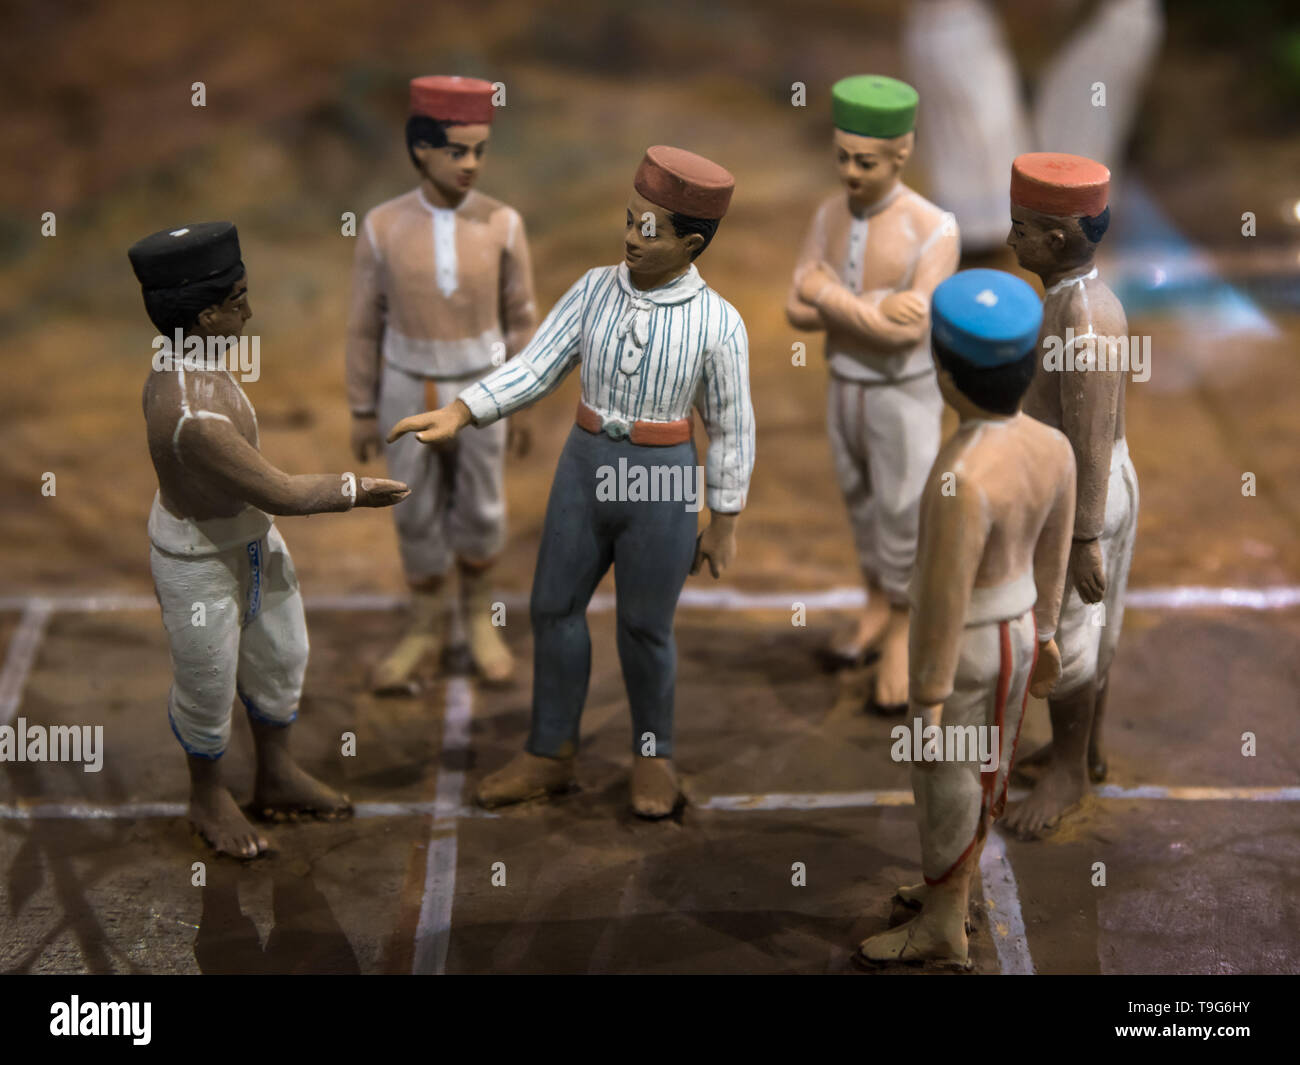 Atya Patya game diorama, Dr Bhau Daji Lad Museum, Mumbai, India Stock Photo